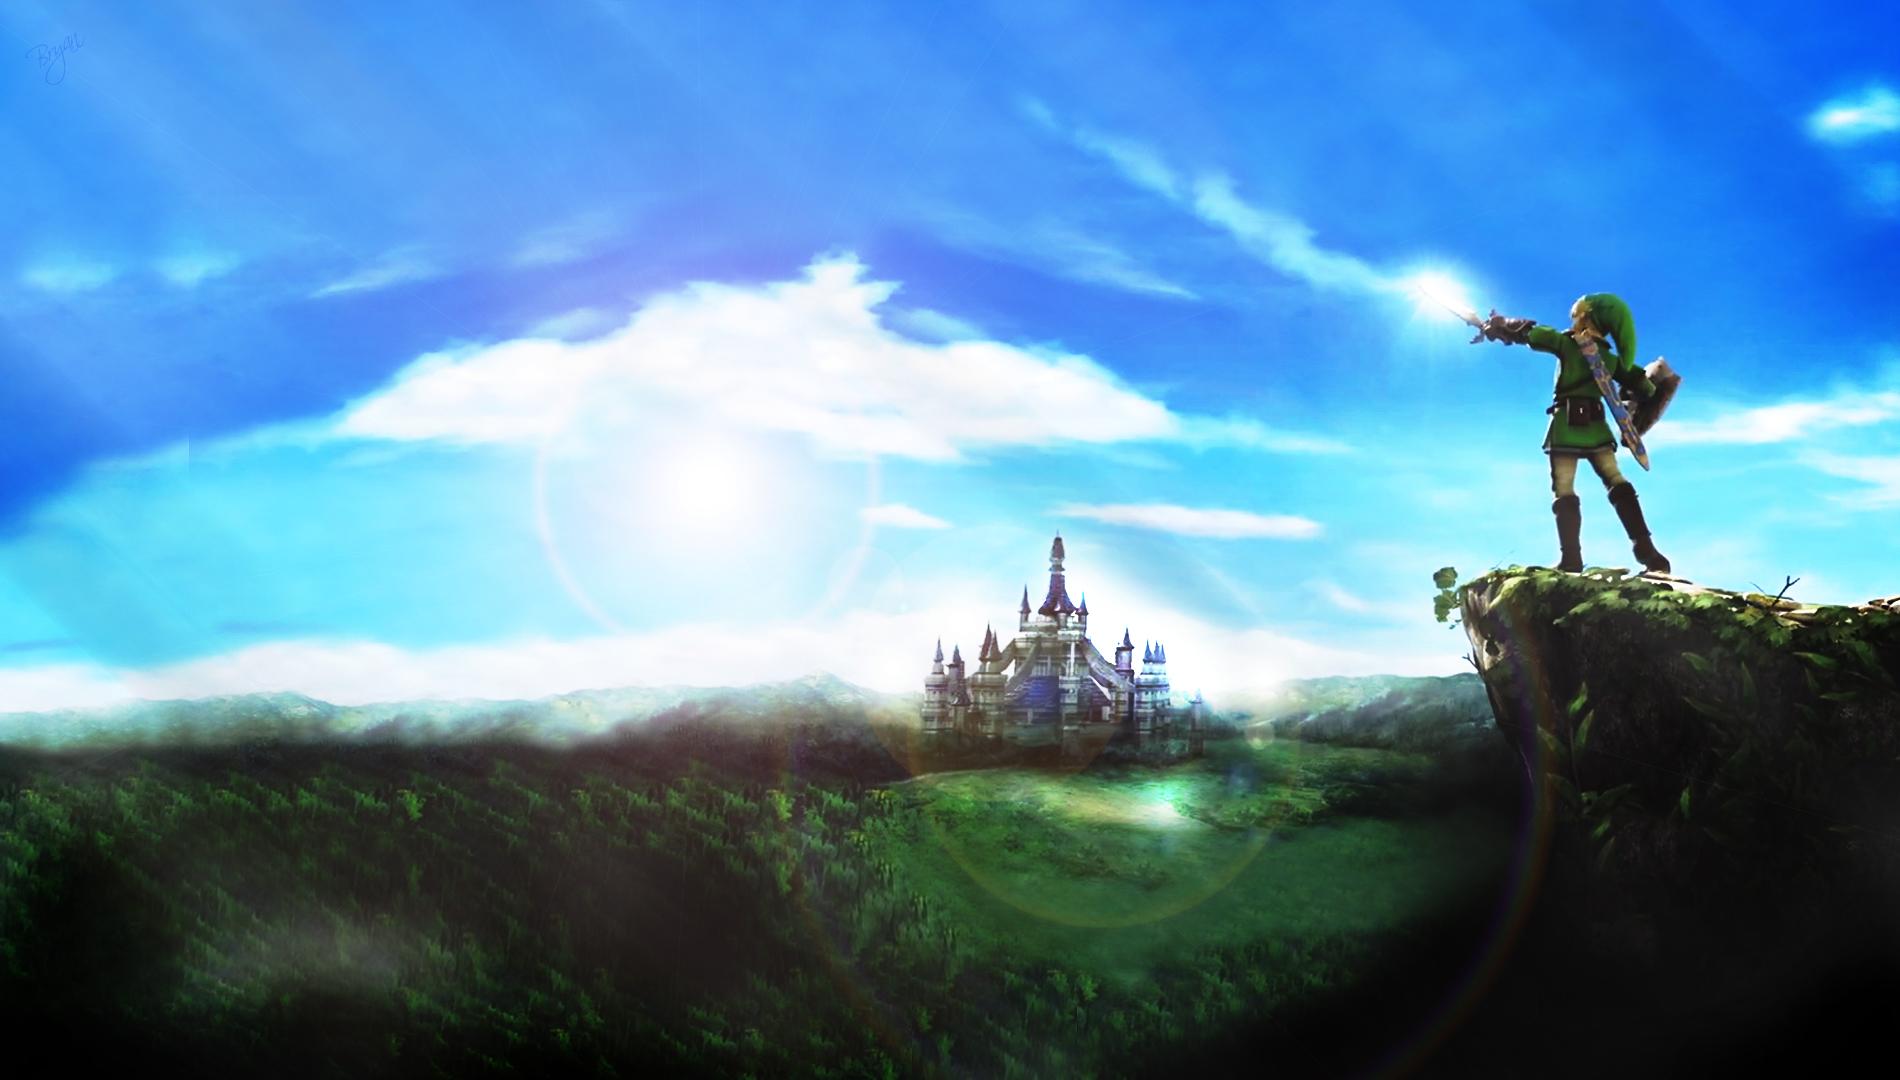 Zelda Backgrounds download Wallpapers Backgrounds Images Art 1900x1080